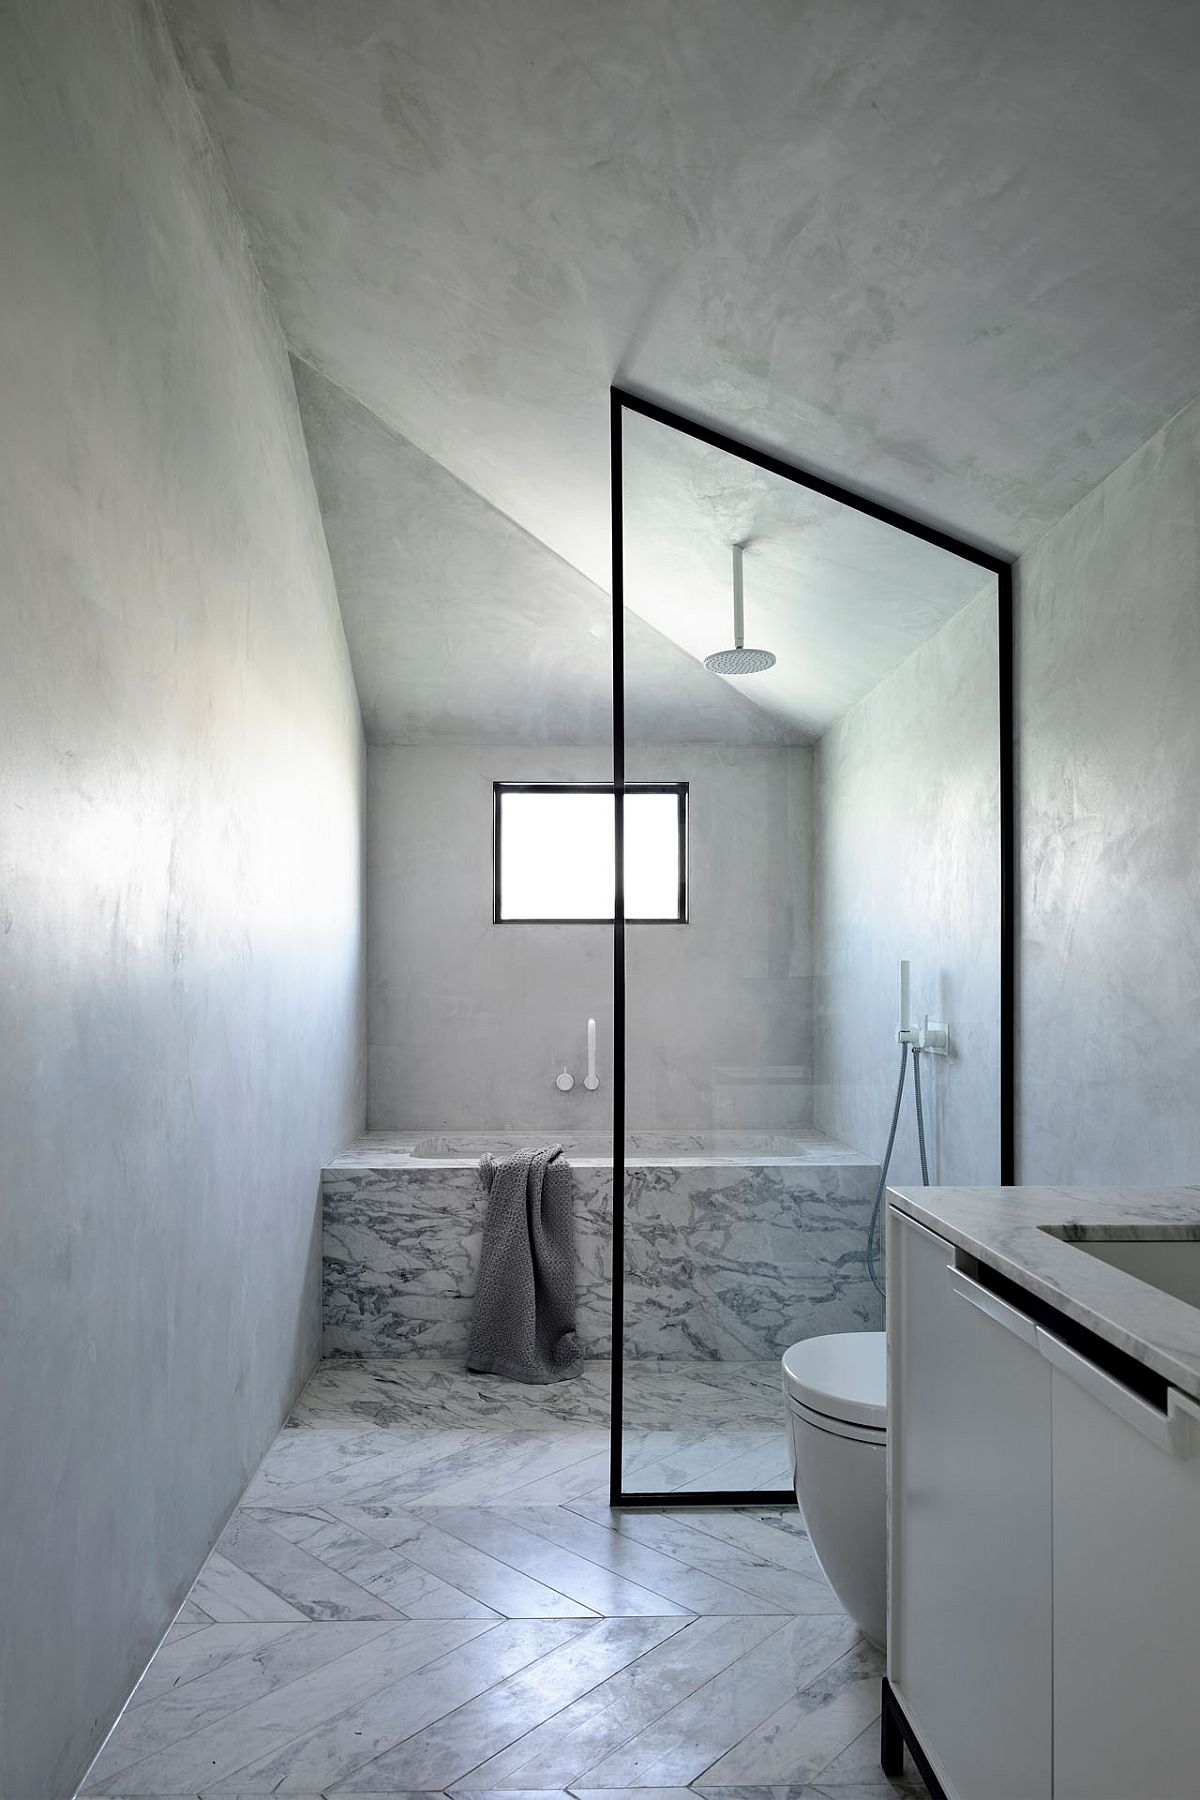 Window in the corner brings light in the minimal white bathroom